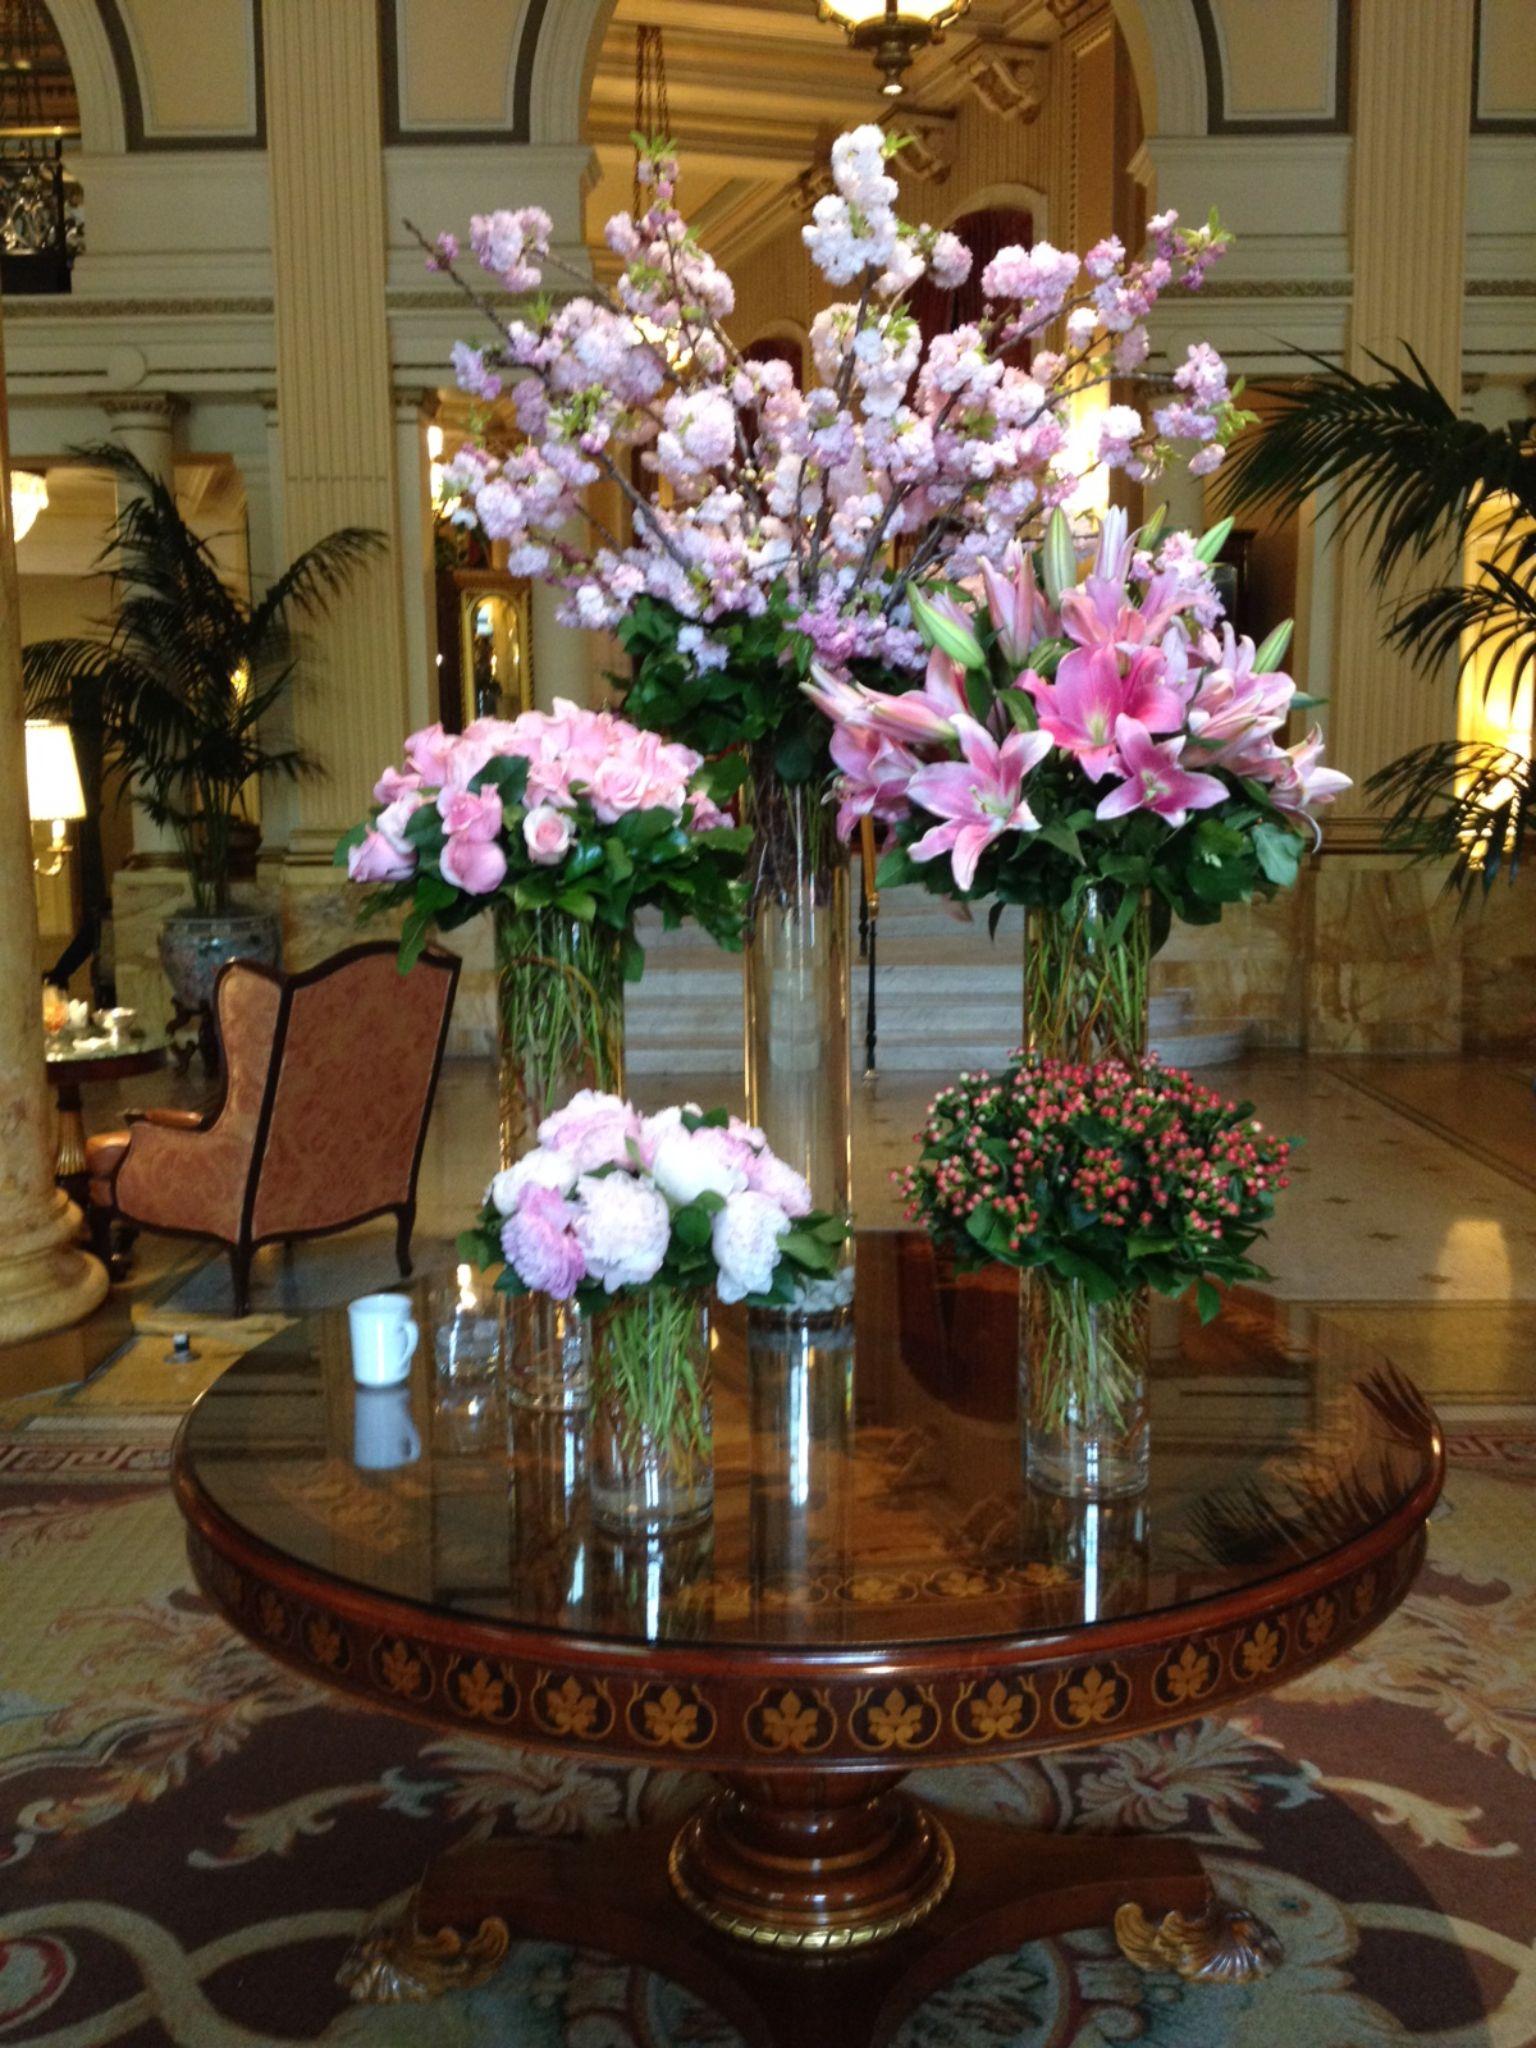 Willard Hotel, Washington, DC May 2015 Modern flower